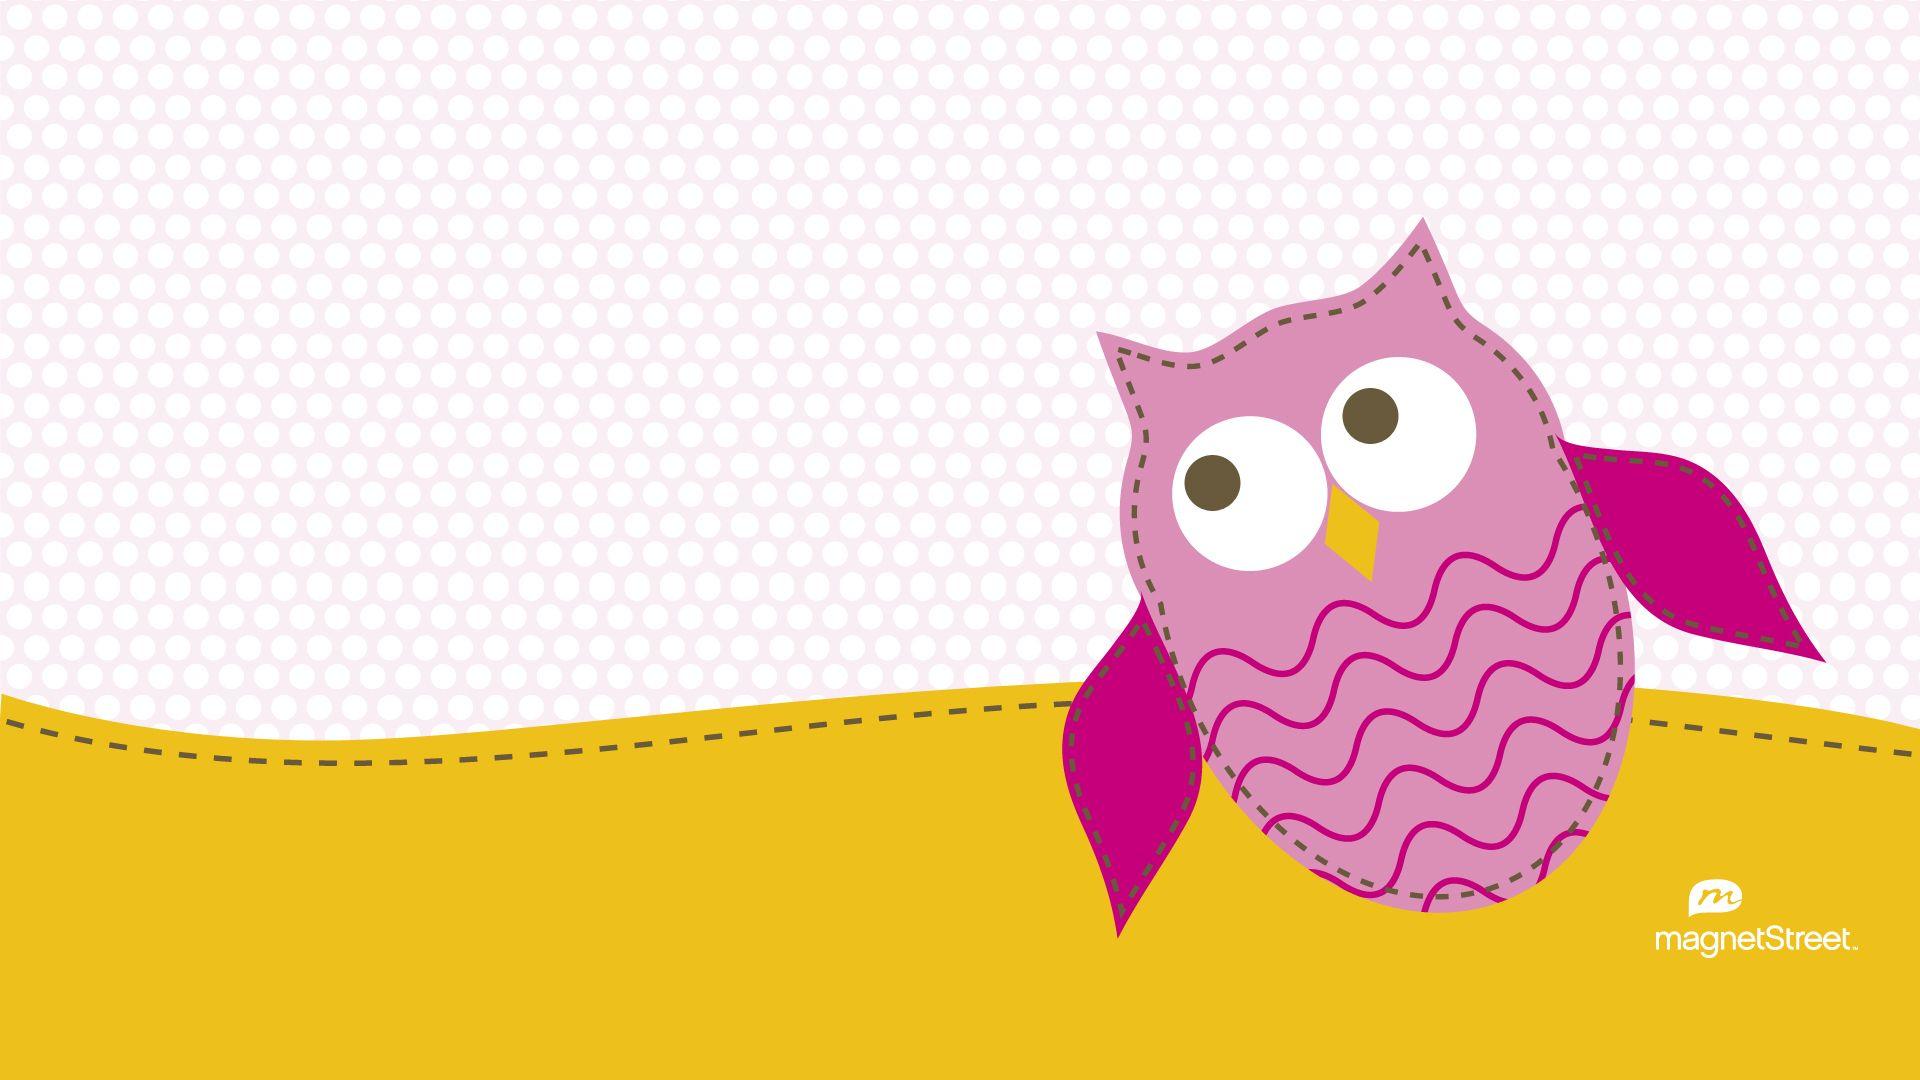 Owl Hd Wallpapers Backgrounds Wallpaper